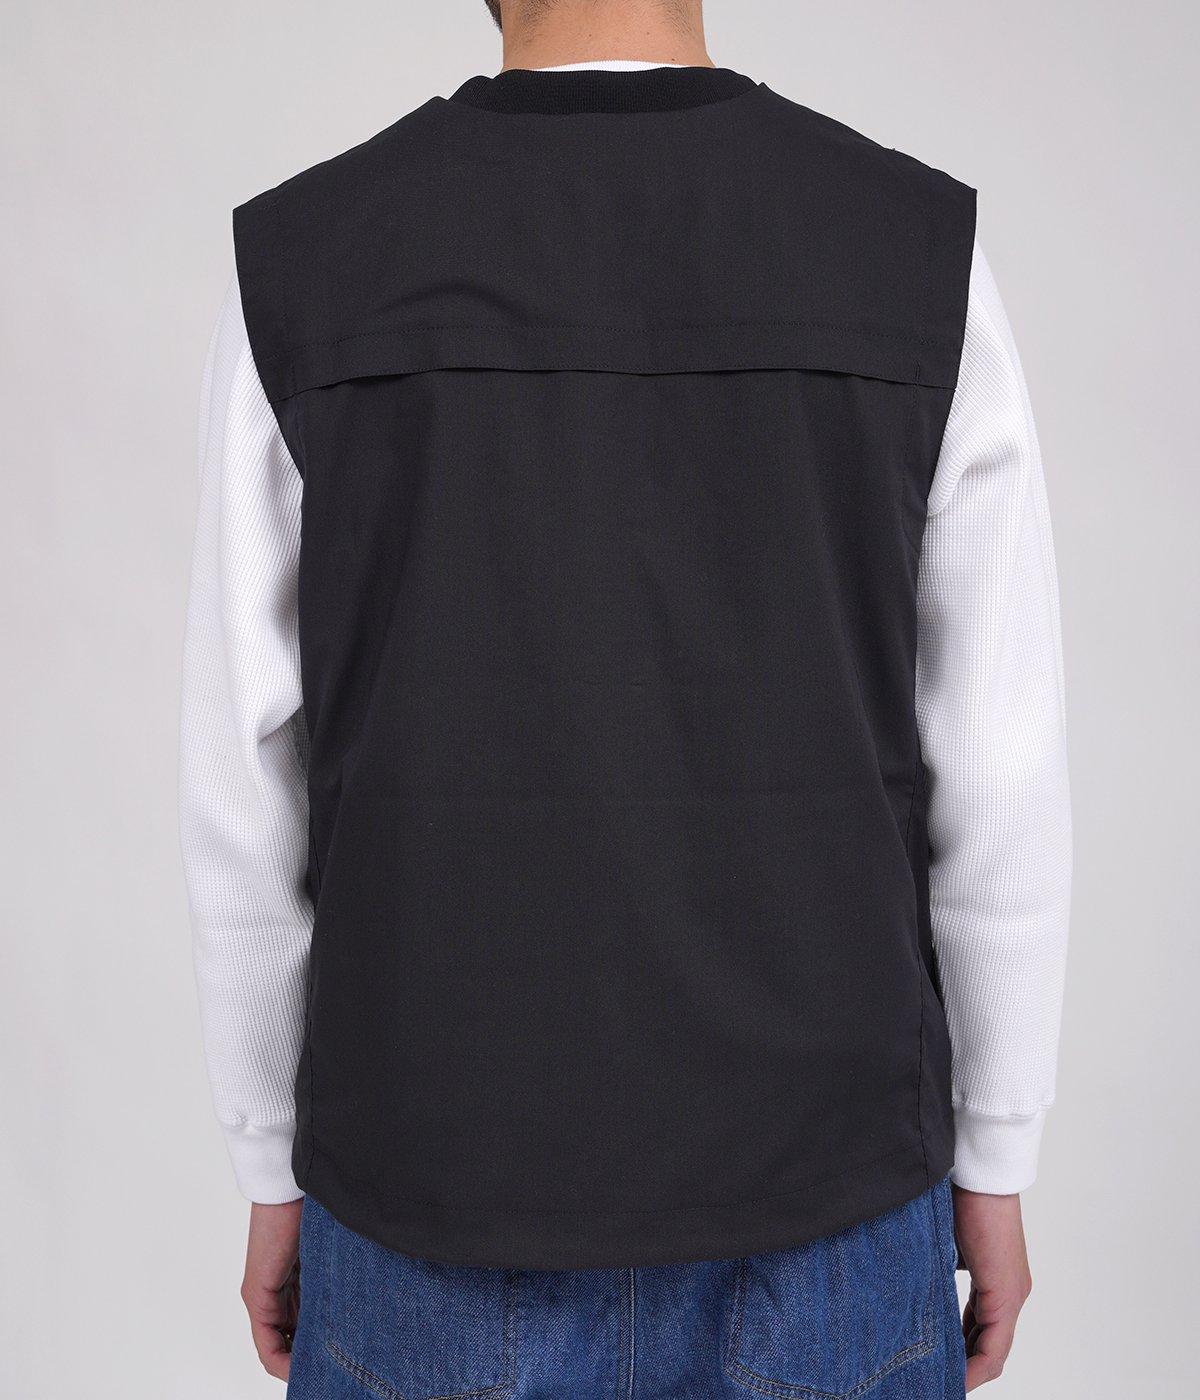 BLADE Vest